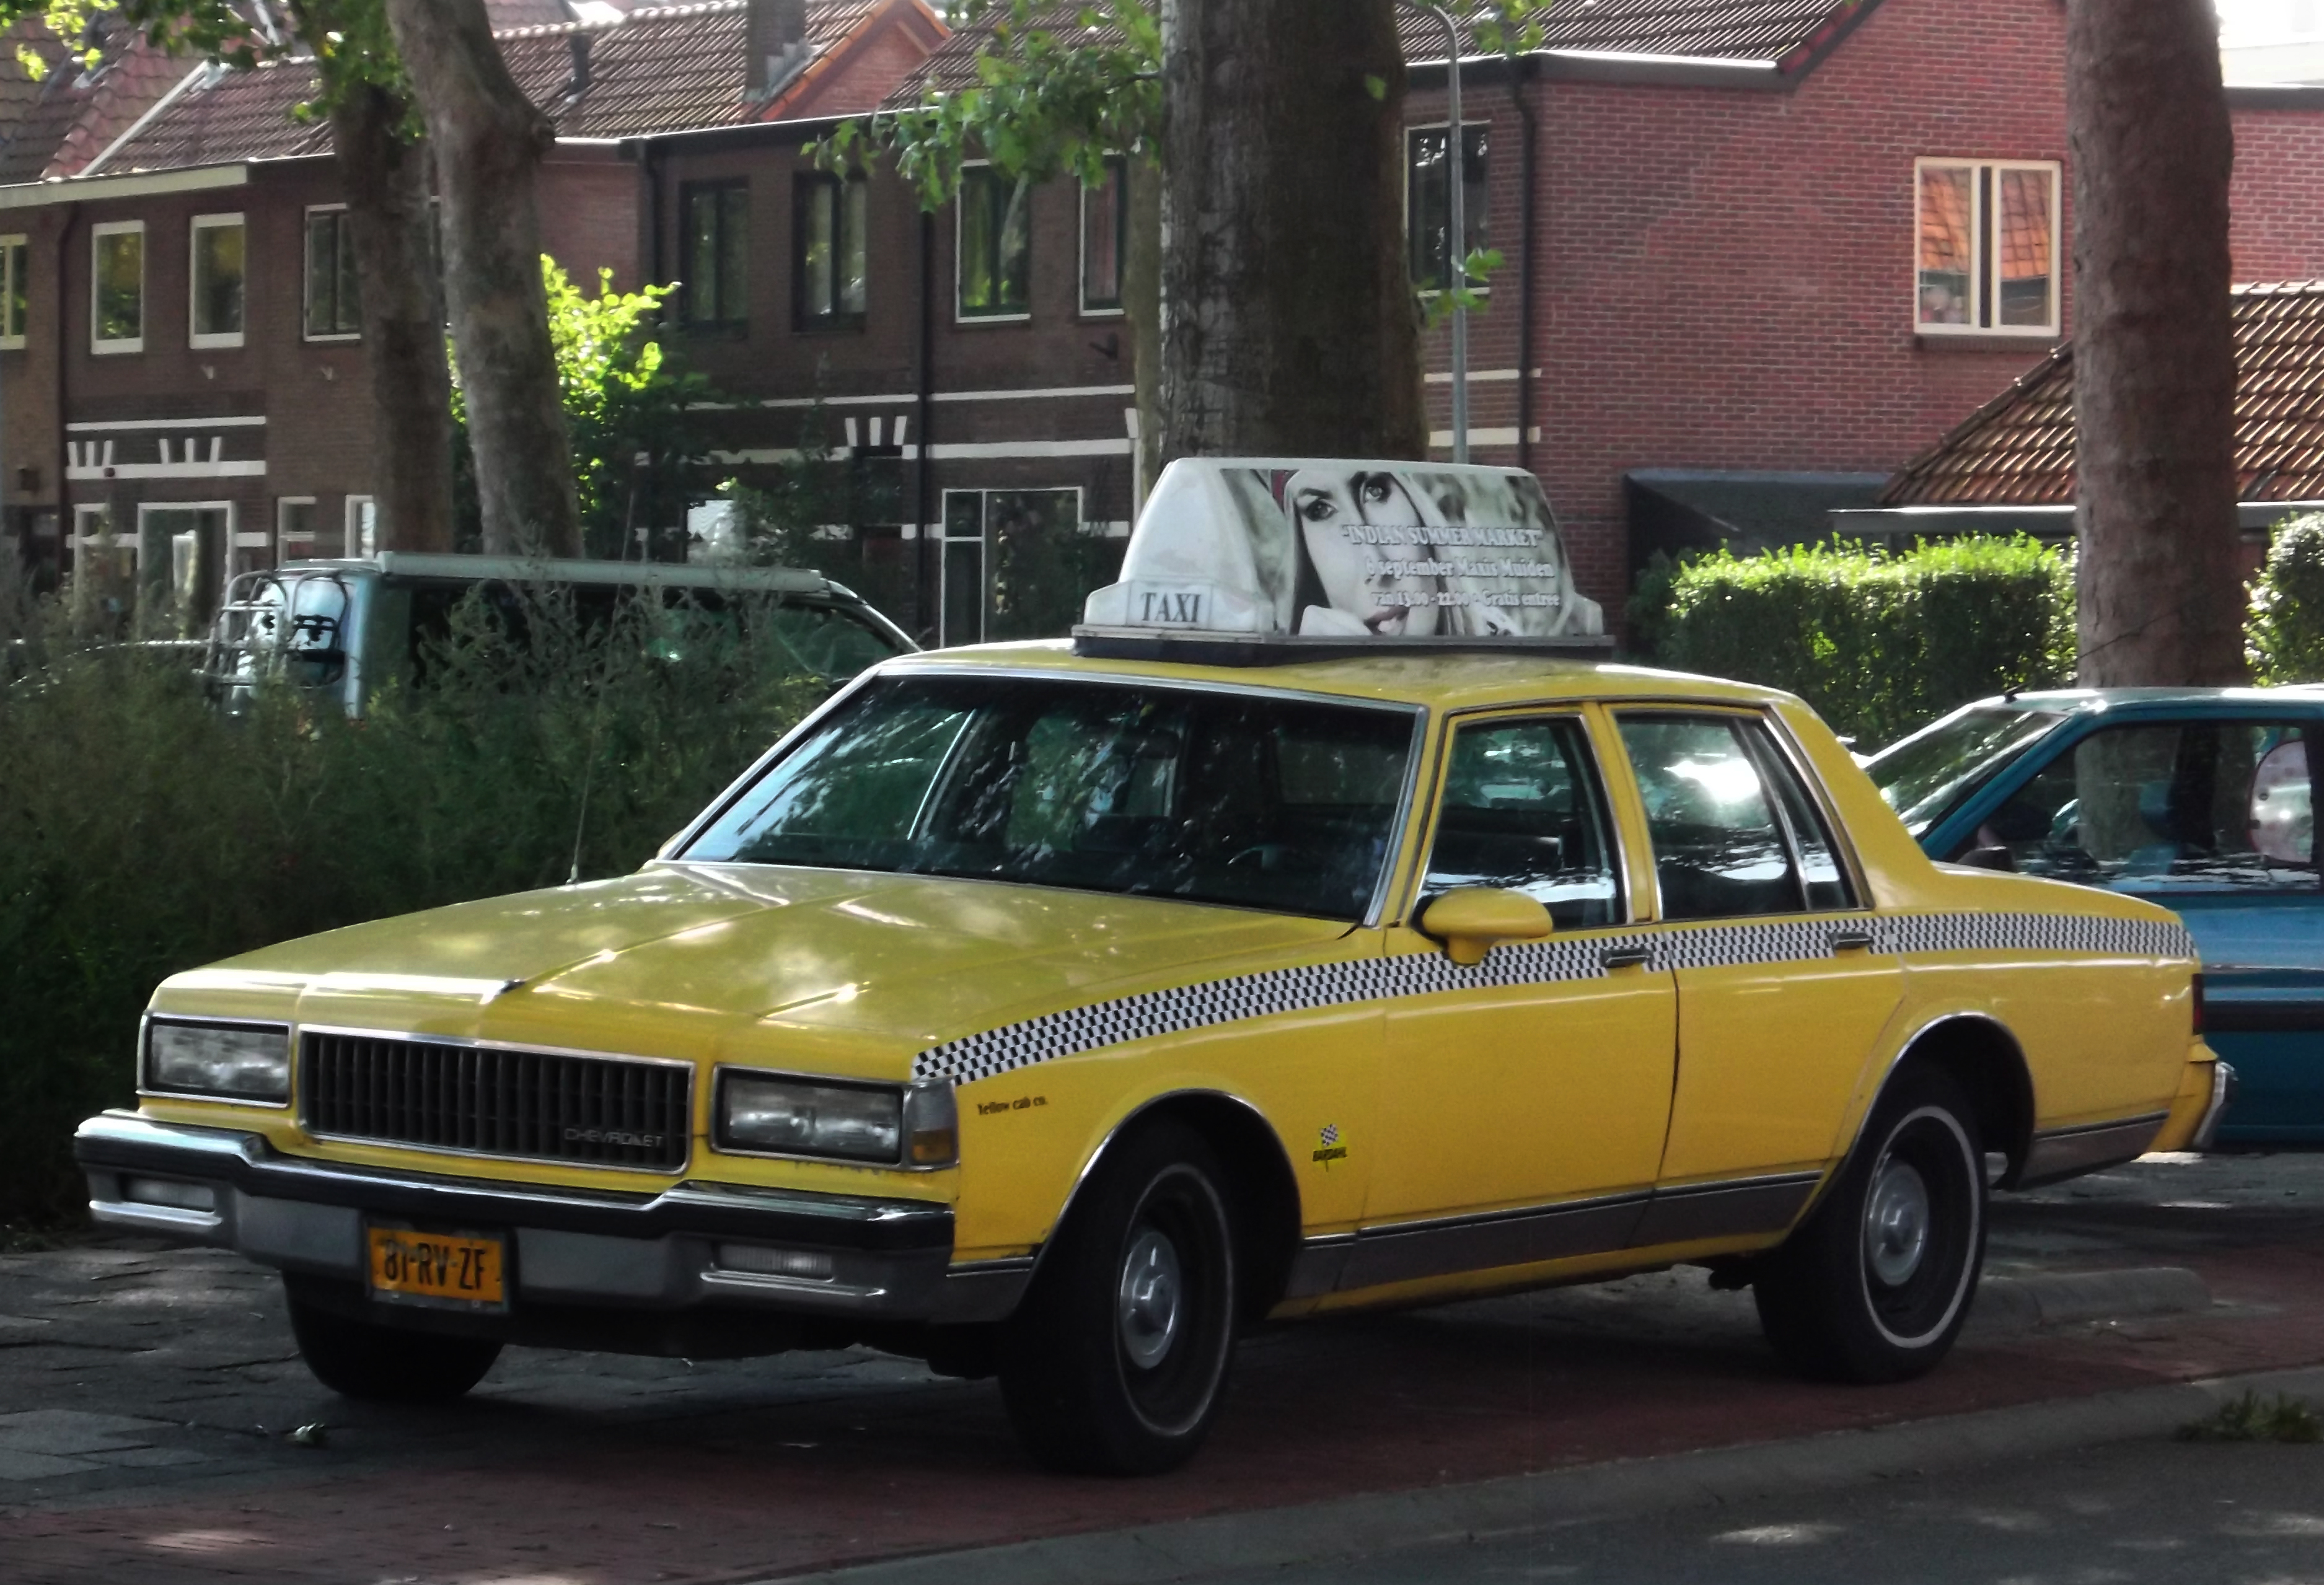 File:Chevrolet Caprice Classic (10022668953) jpg - Wikimedia Commons